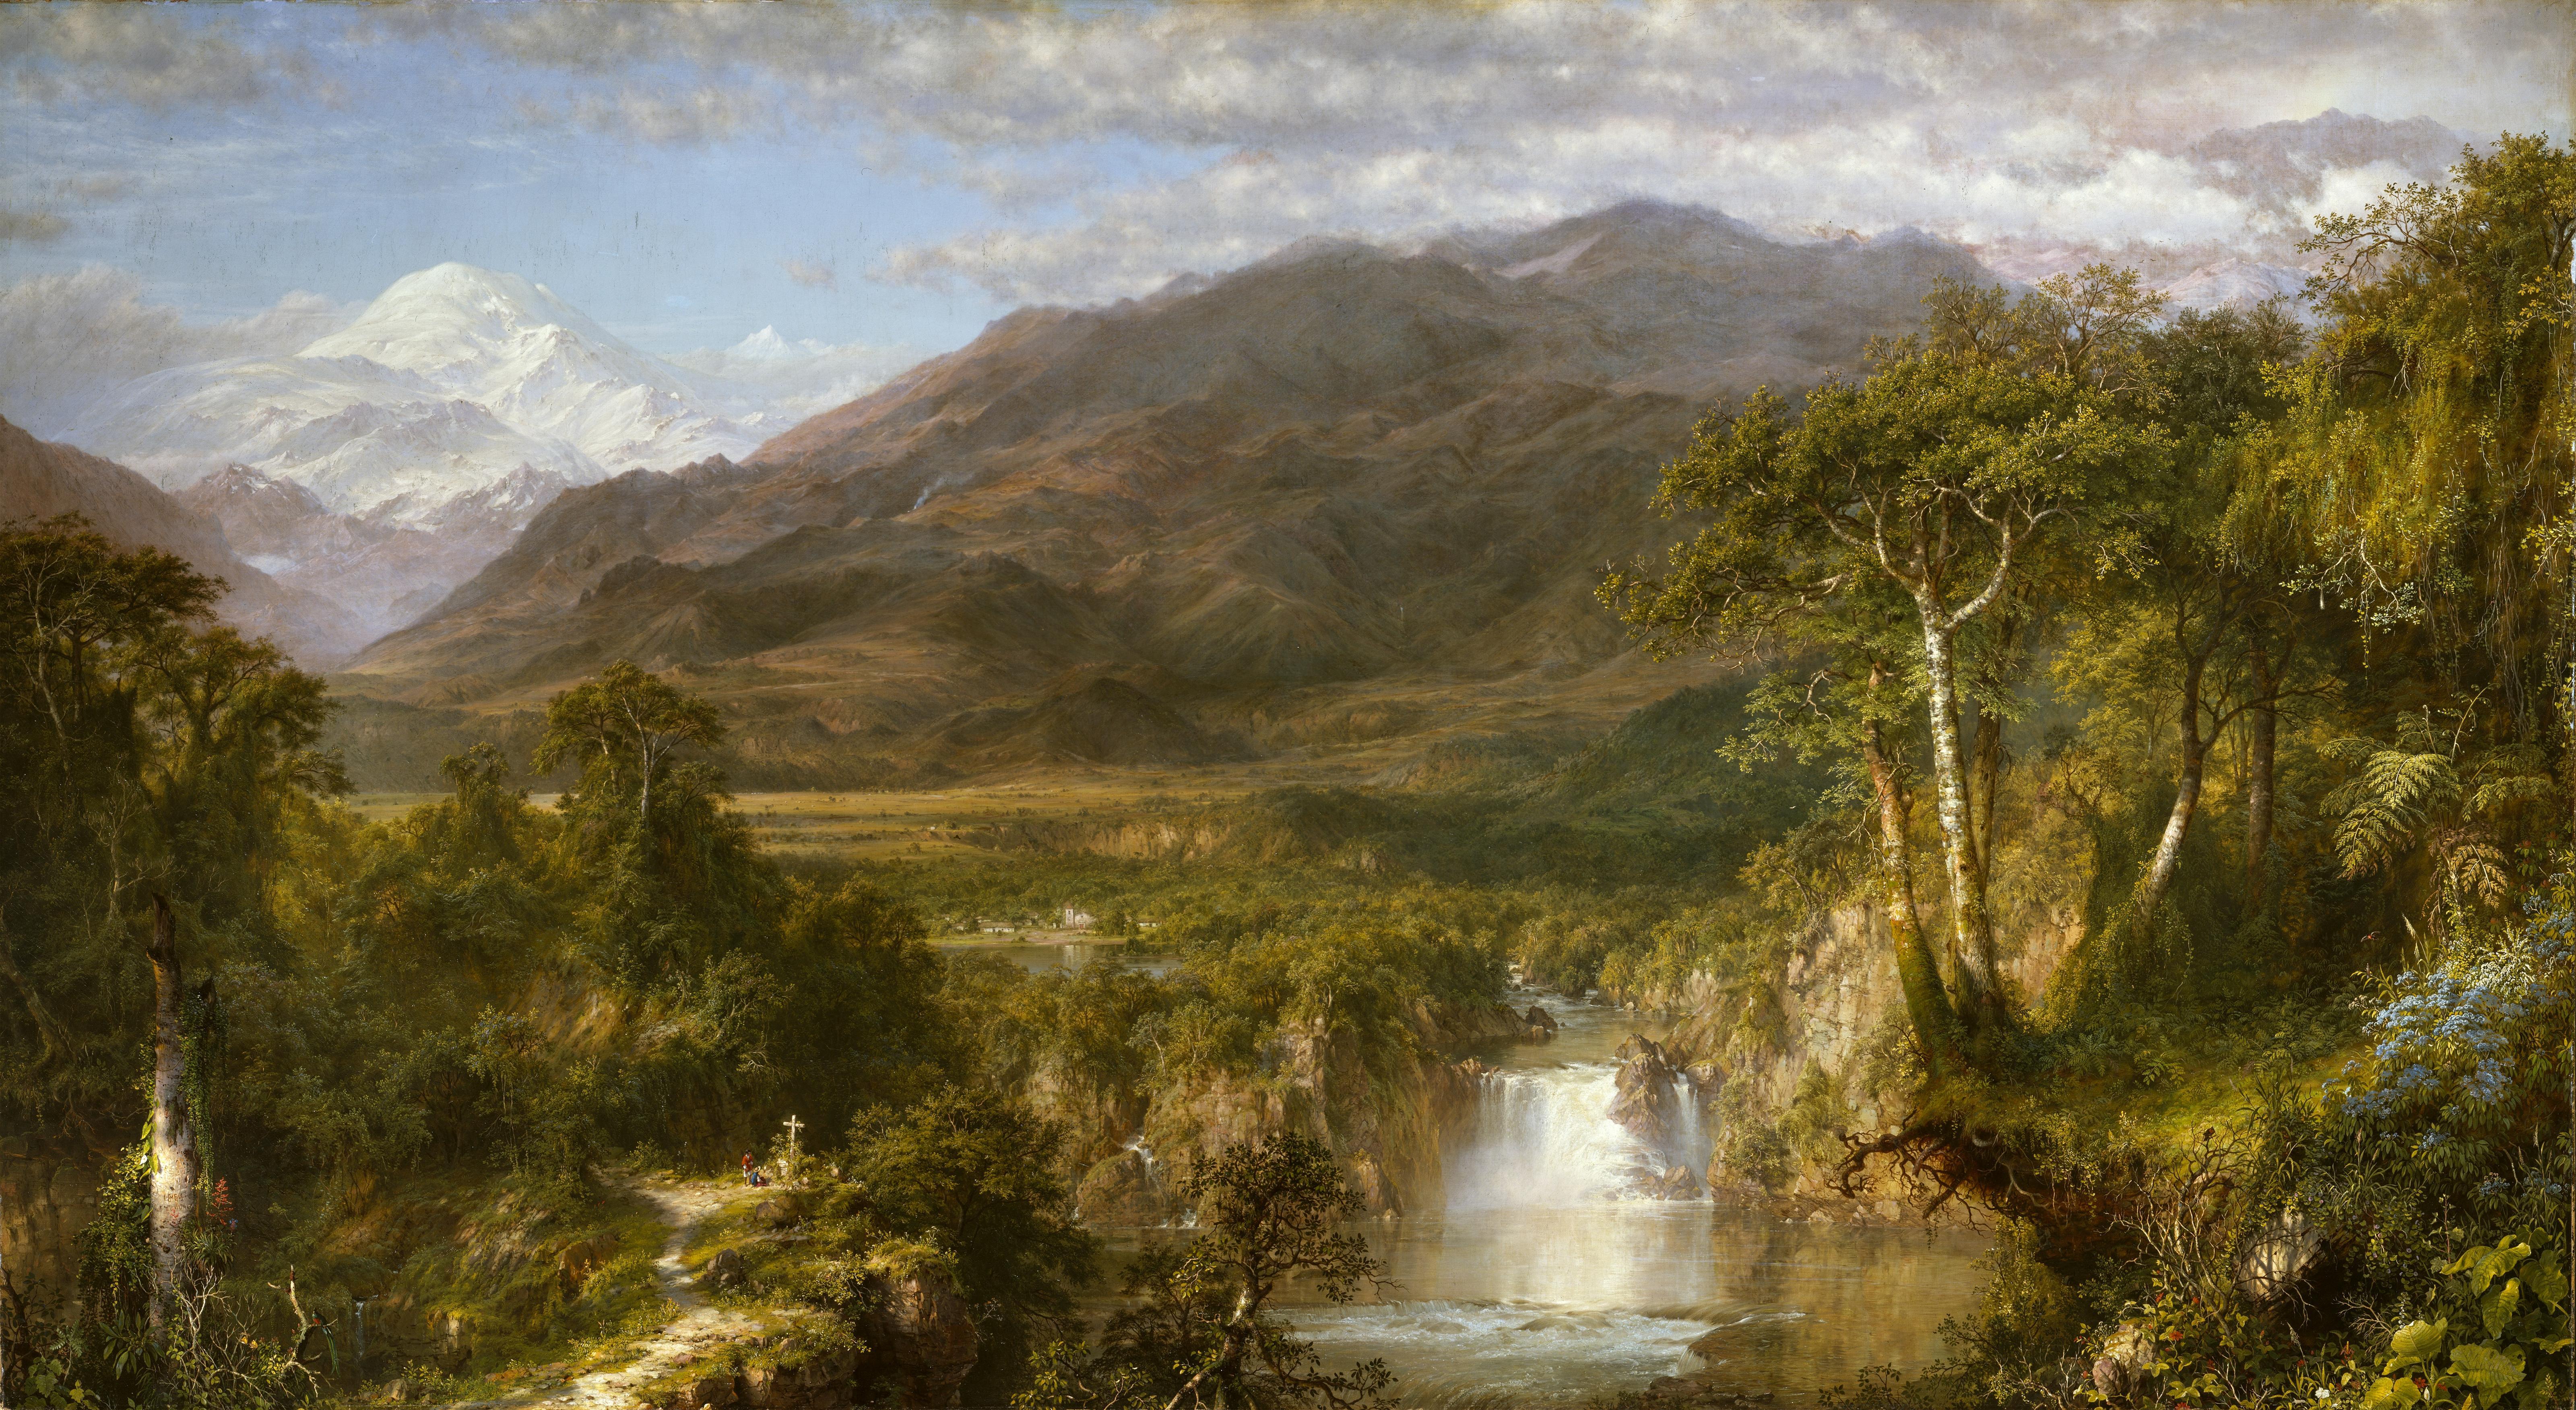 Heart of the Andes (1859), Metropolitan Museum of Art